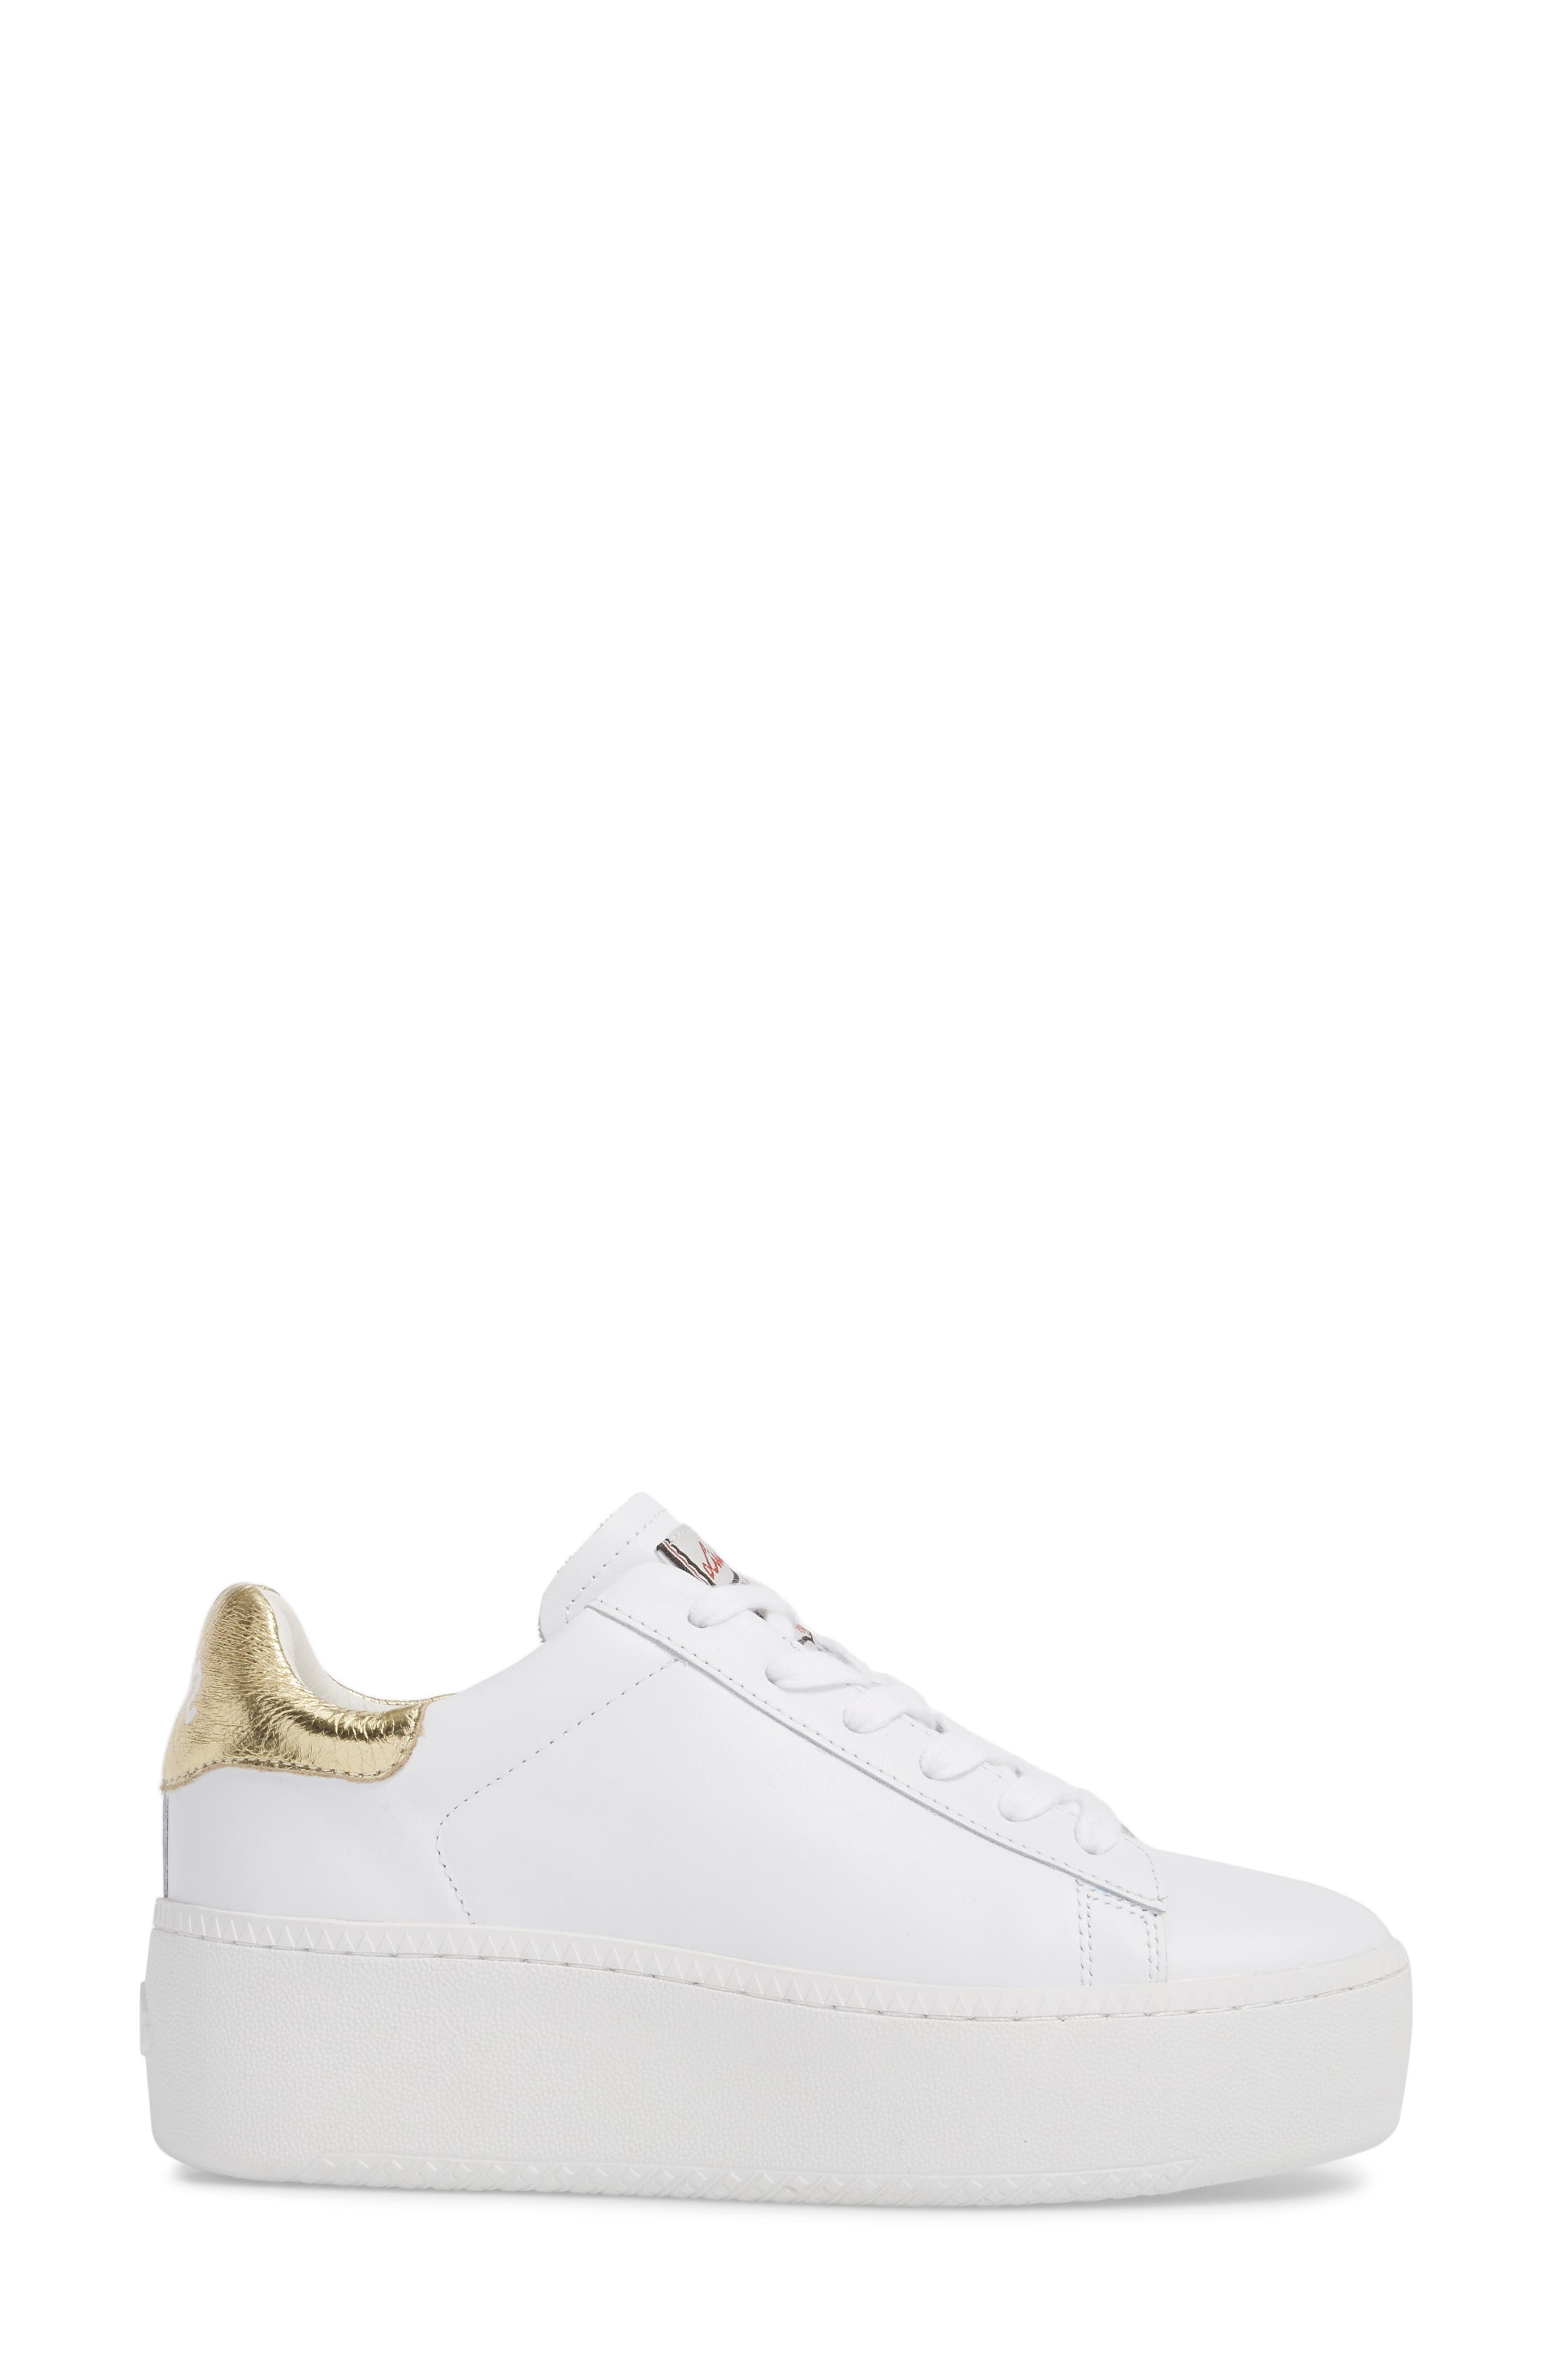 Cult Platform Sneaker,                             Alternate thumbnail 3, color,                             100